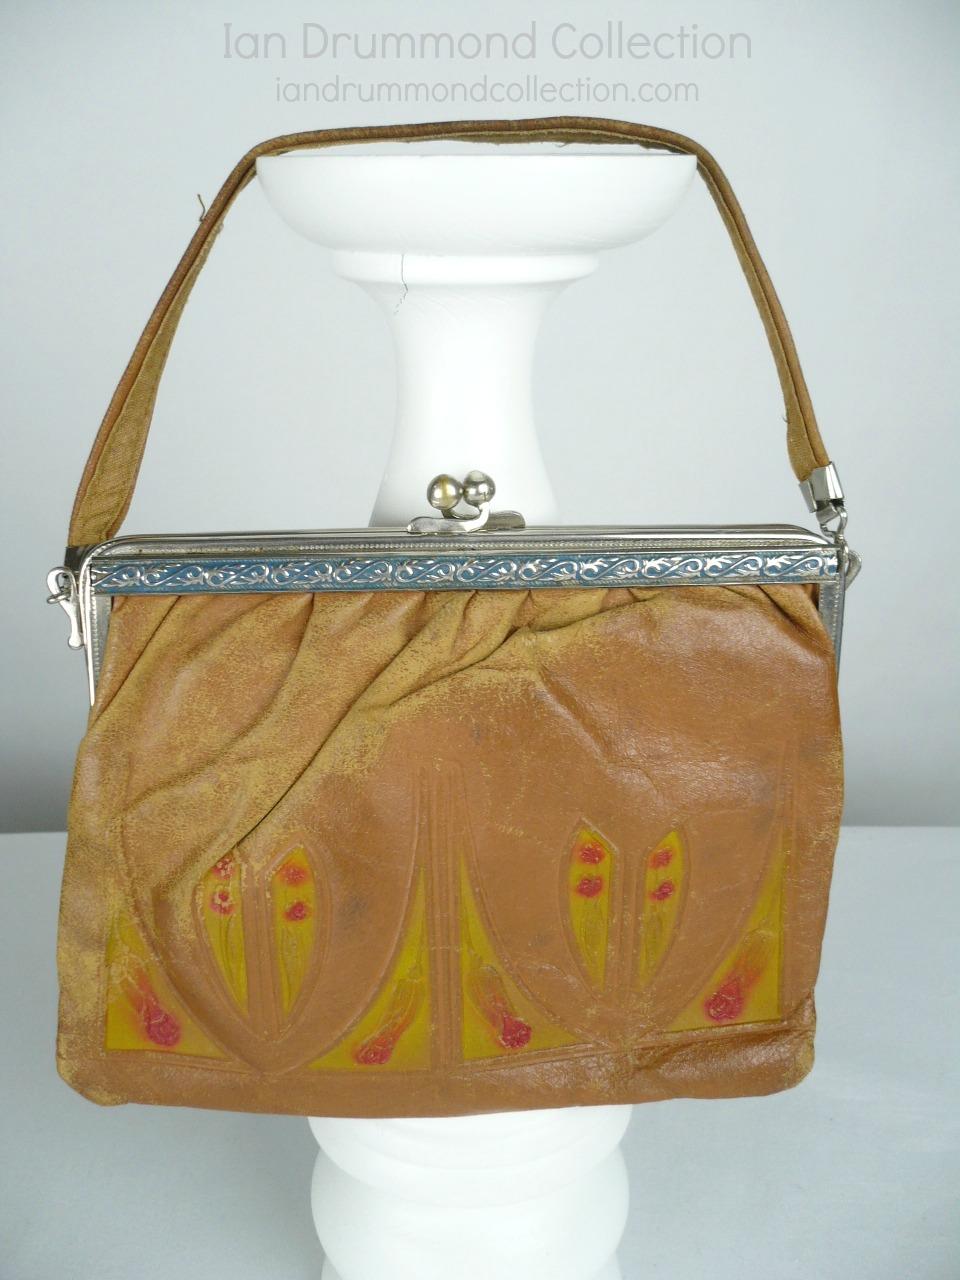 Ian Drummond Collection TV Movie Vintage Clothing Wardrobe Rental Toronto 1920s purse 12 (1)